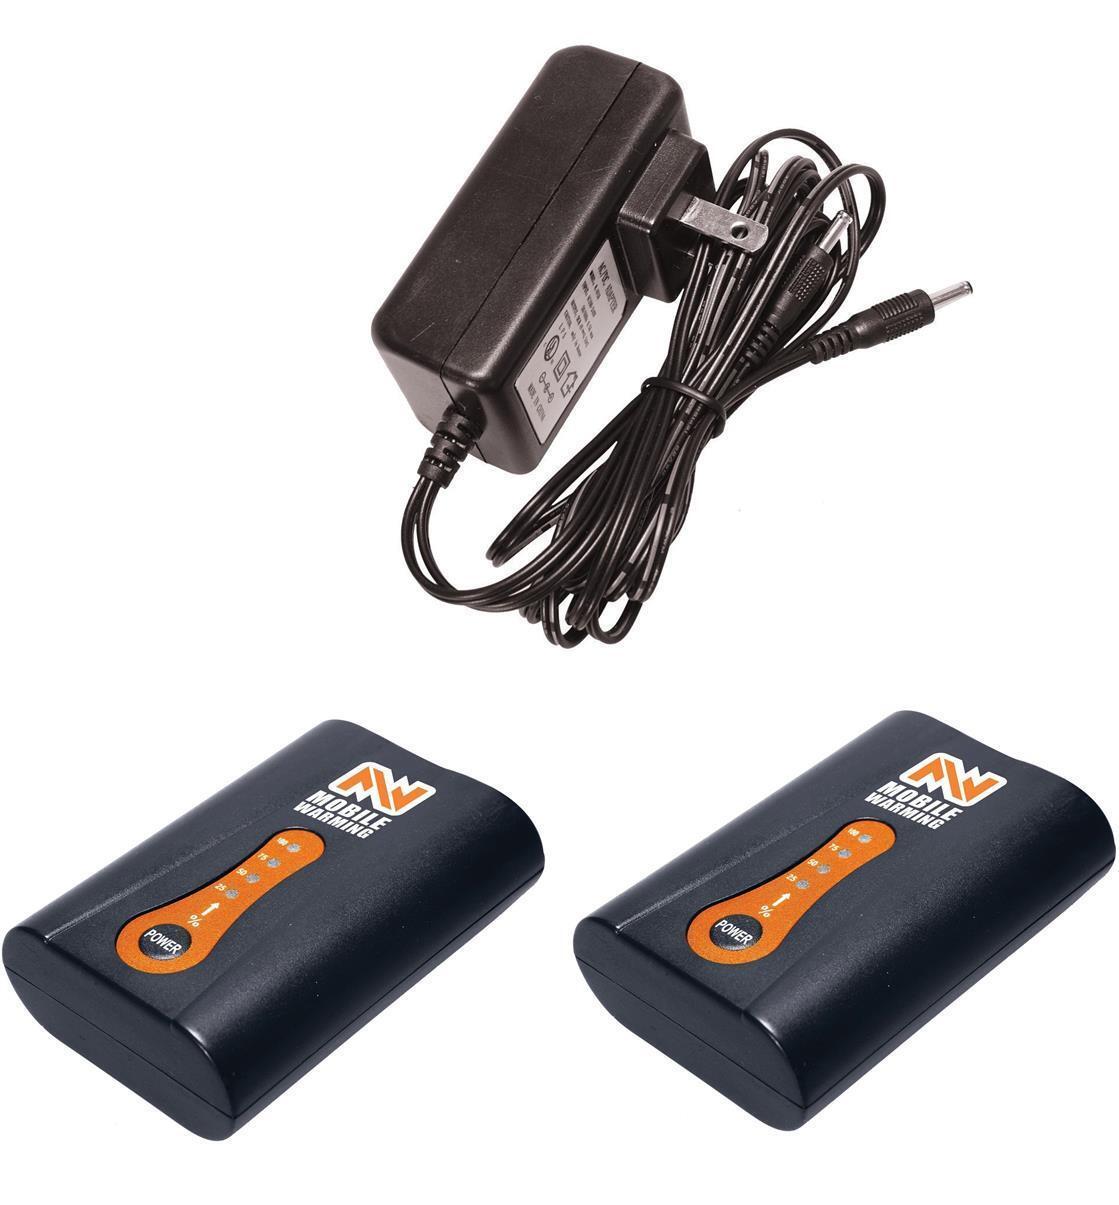 ANSAI Mobile Warming Rechargeable 7.4-Volt Lithium-Ion Batteries w/ Dual charger